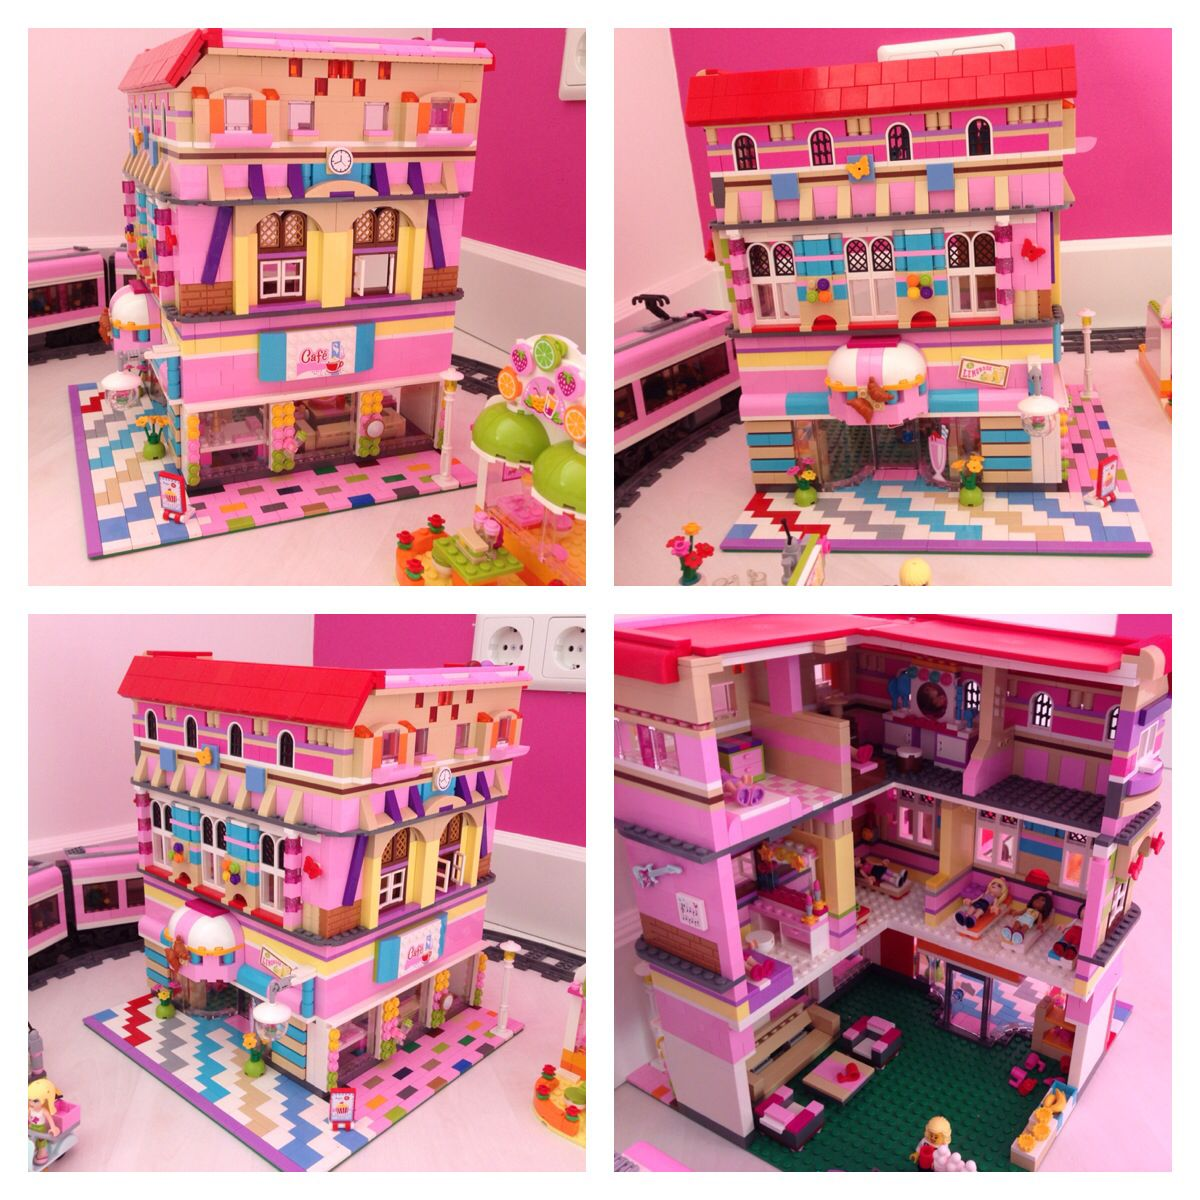 Lego Friends Hotel Lego For Kids Lego Friends Sets Lego Friends